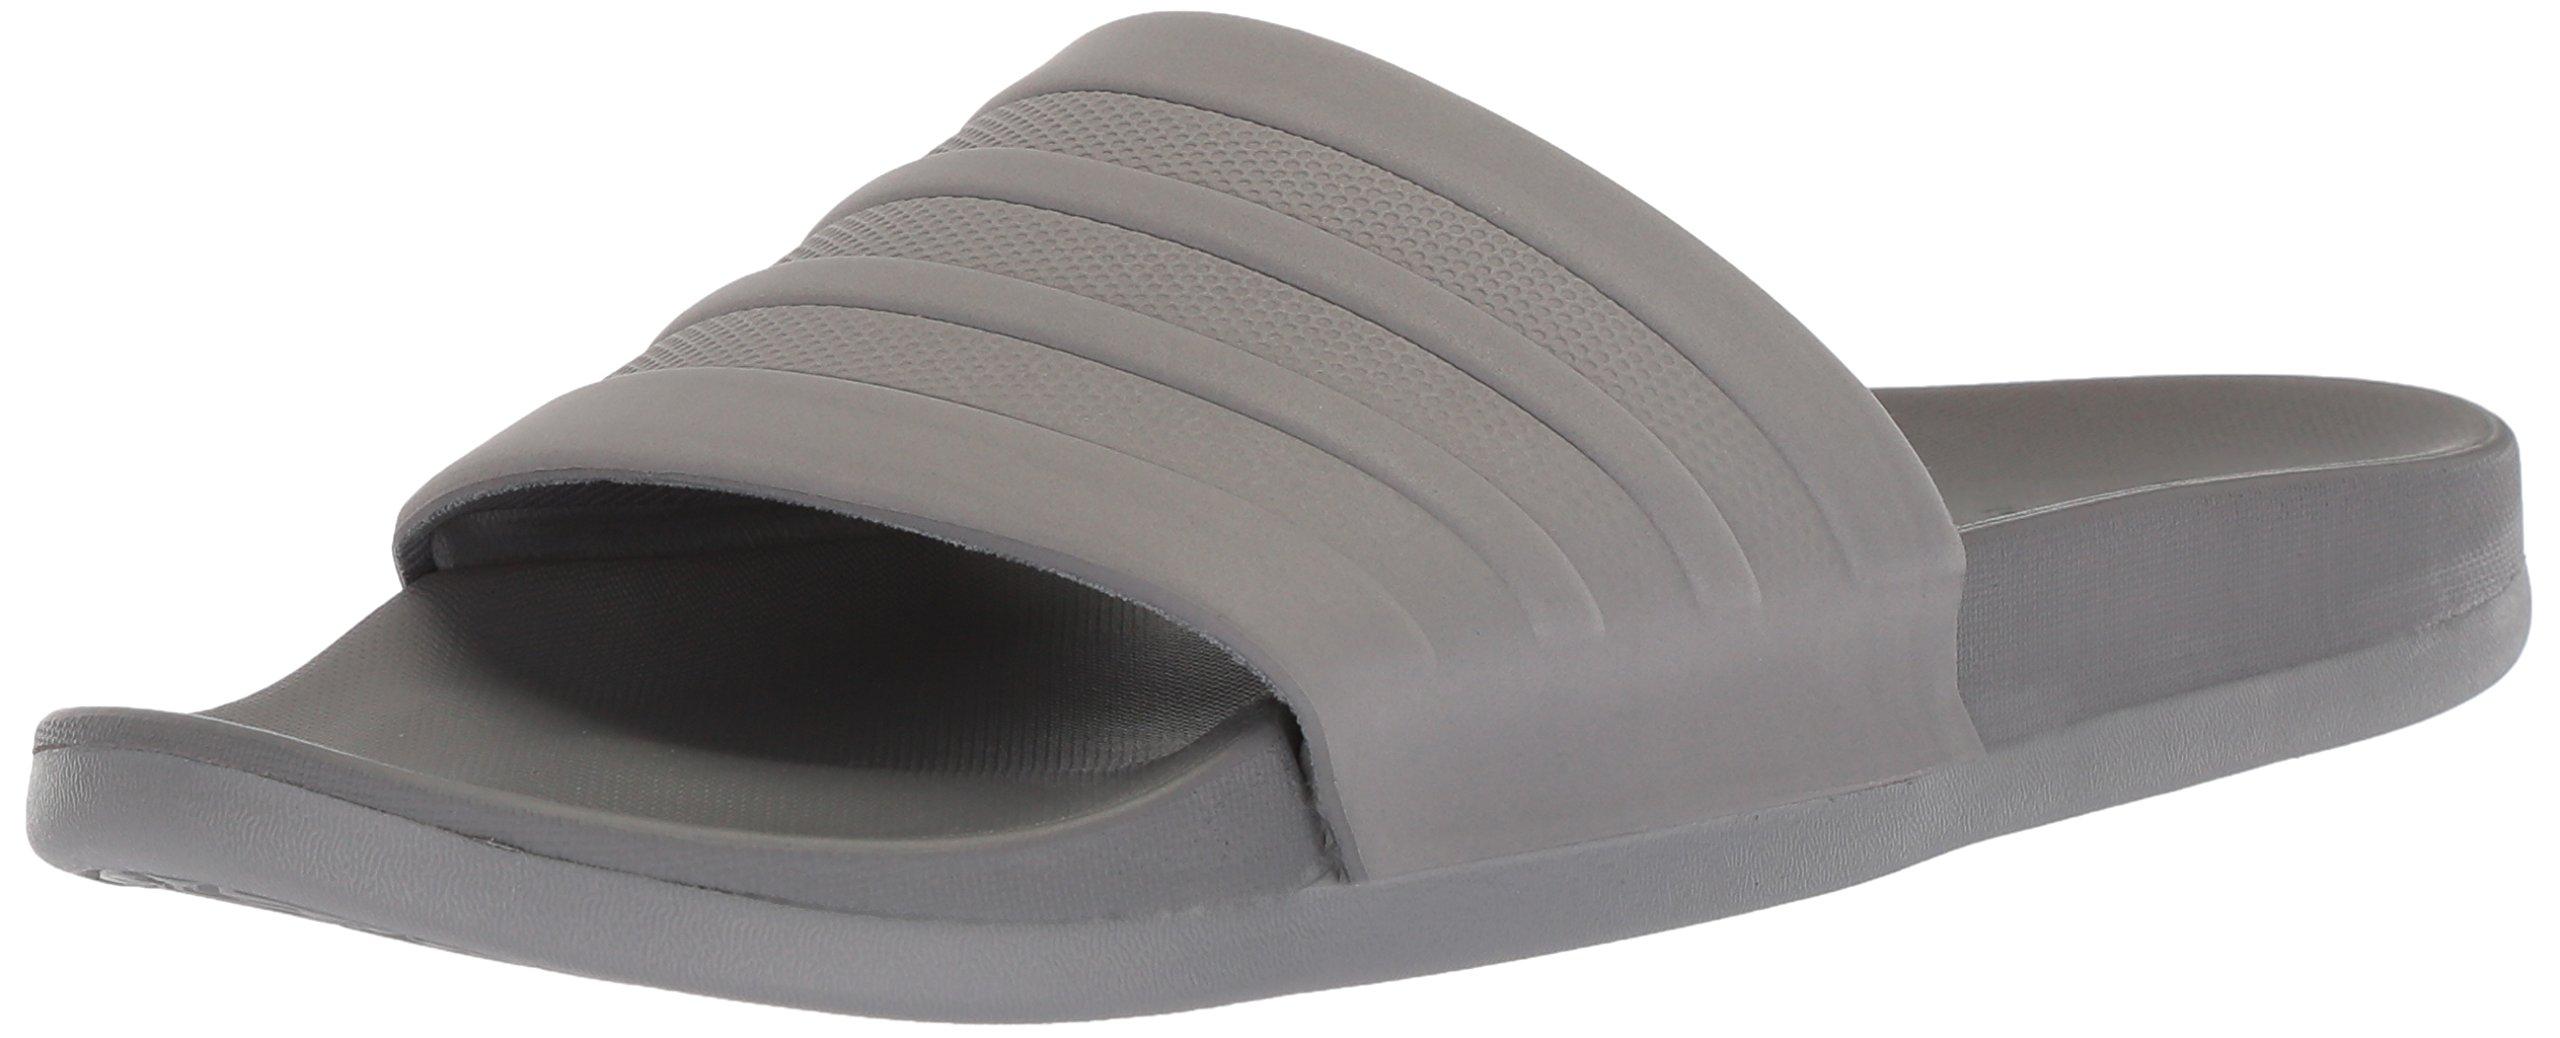 adidas Performance  Men's Adilette Comfort Slide Sandal, Grey/Grey/Grey, 11 M US